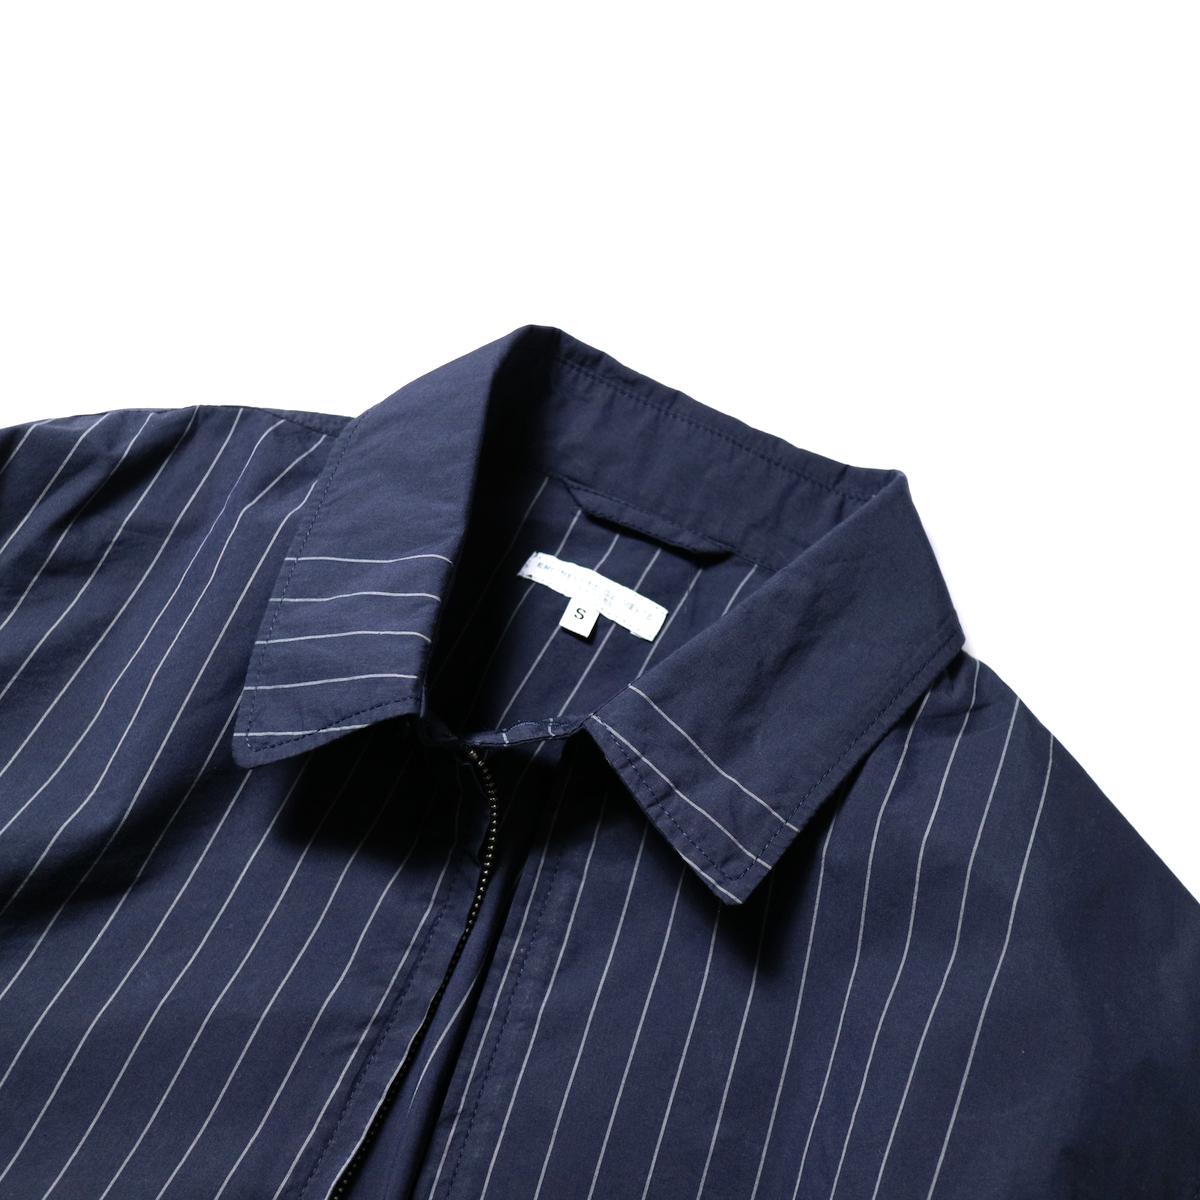 Engineered Garments / Claigton Jacket - Nyco Gangster Stripe (Dk.Navy)襟